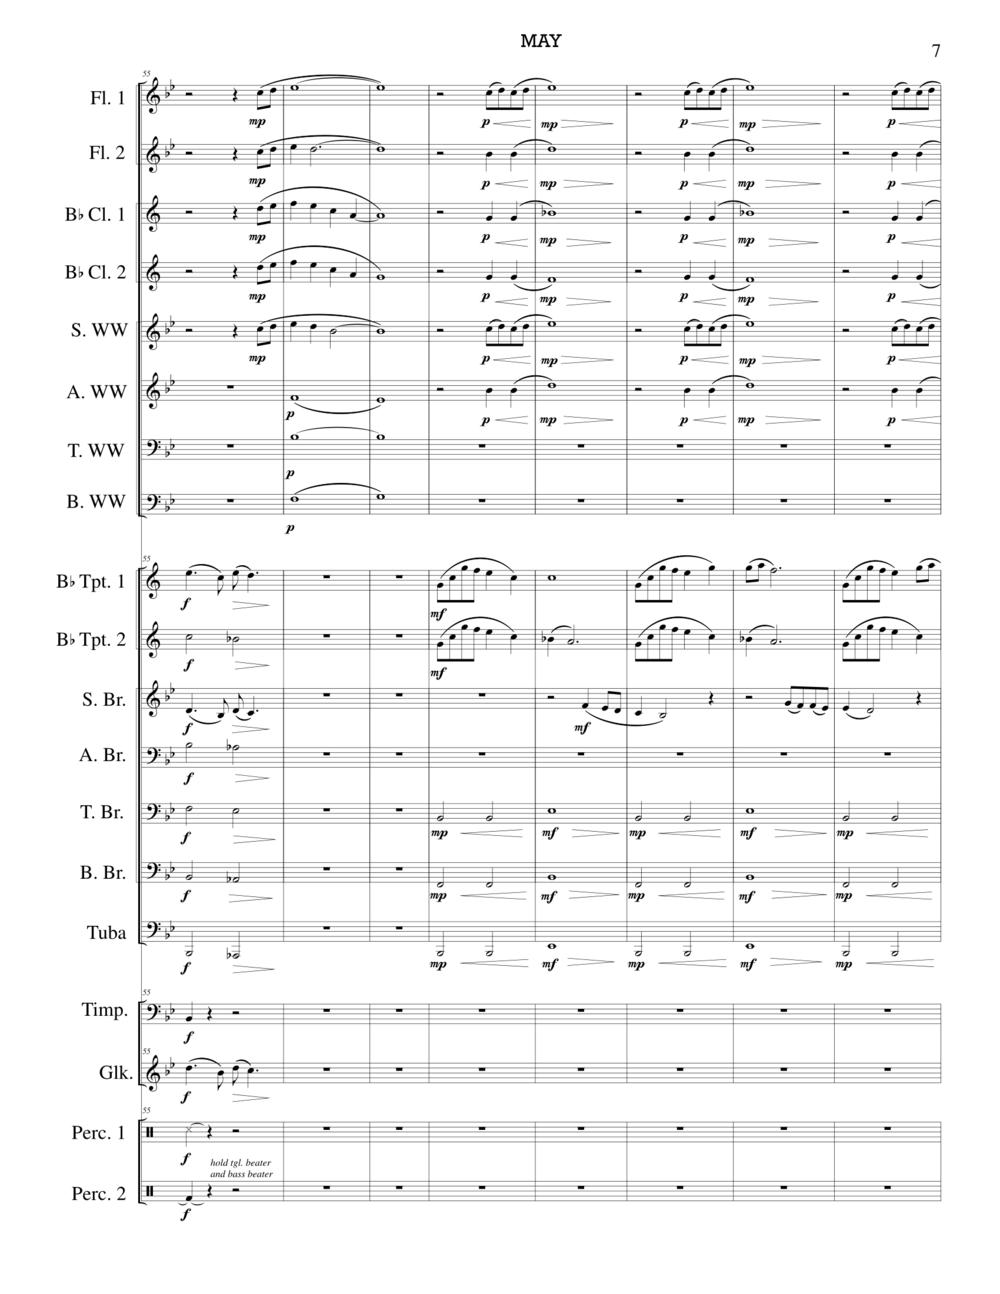 MaySpringDawn - Full Score-09.png